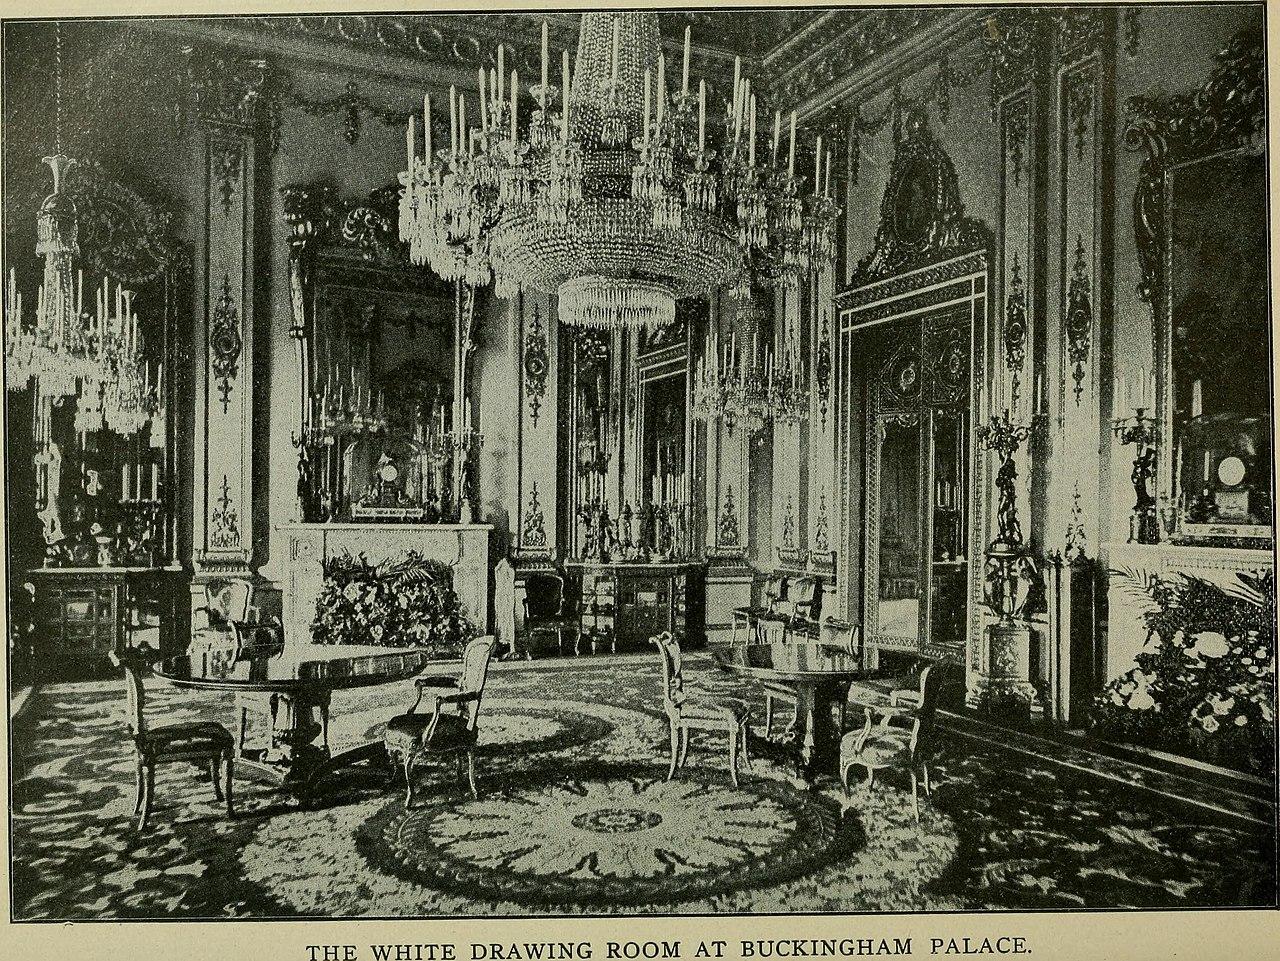 FileThe White Drawing Room at Buckingham Palace c 1901